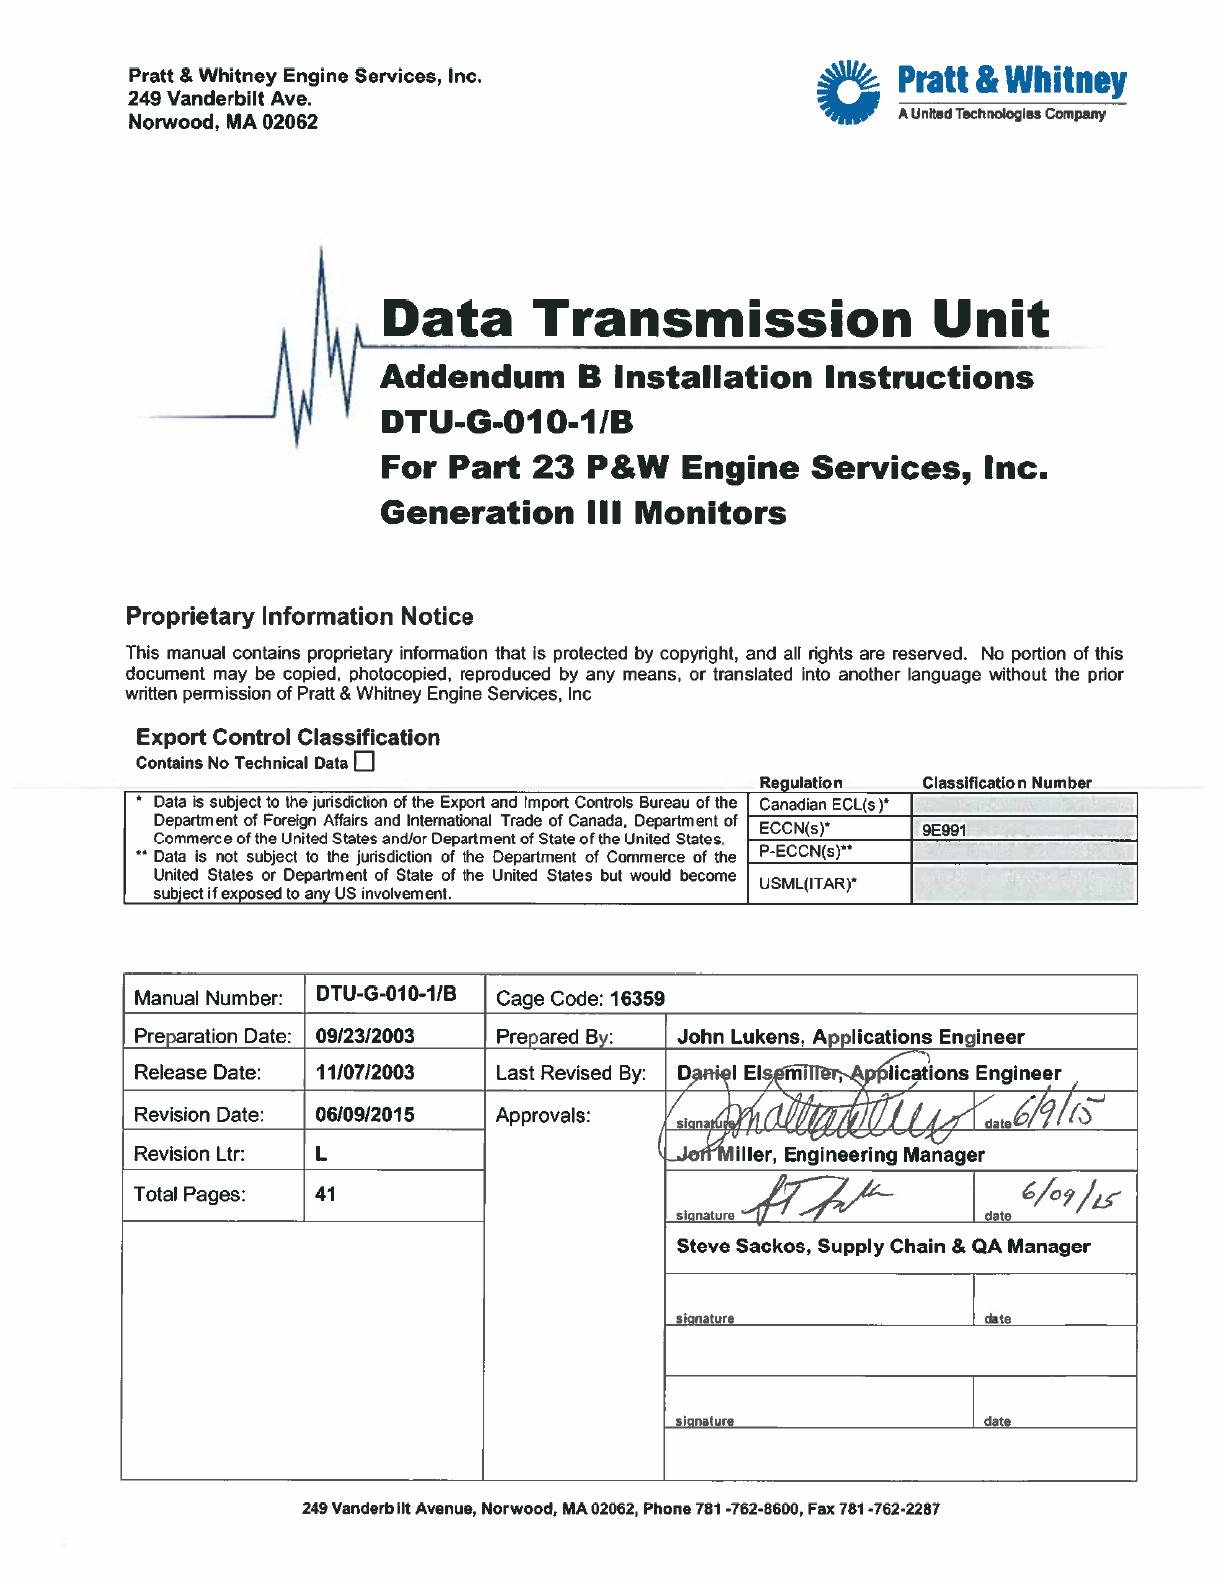 Pratt And Whitney Engine Services Fast34e Flight Data Raytheon Wiring Harness Acquisition Storage Transmission User Manual Dtu G 010 1 B